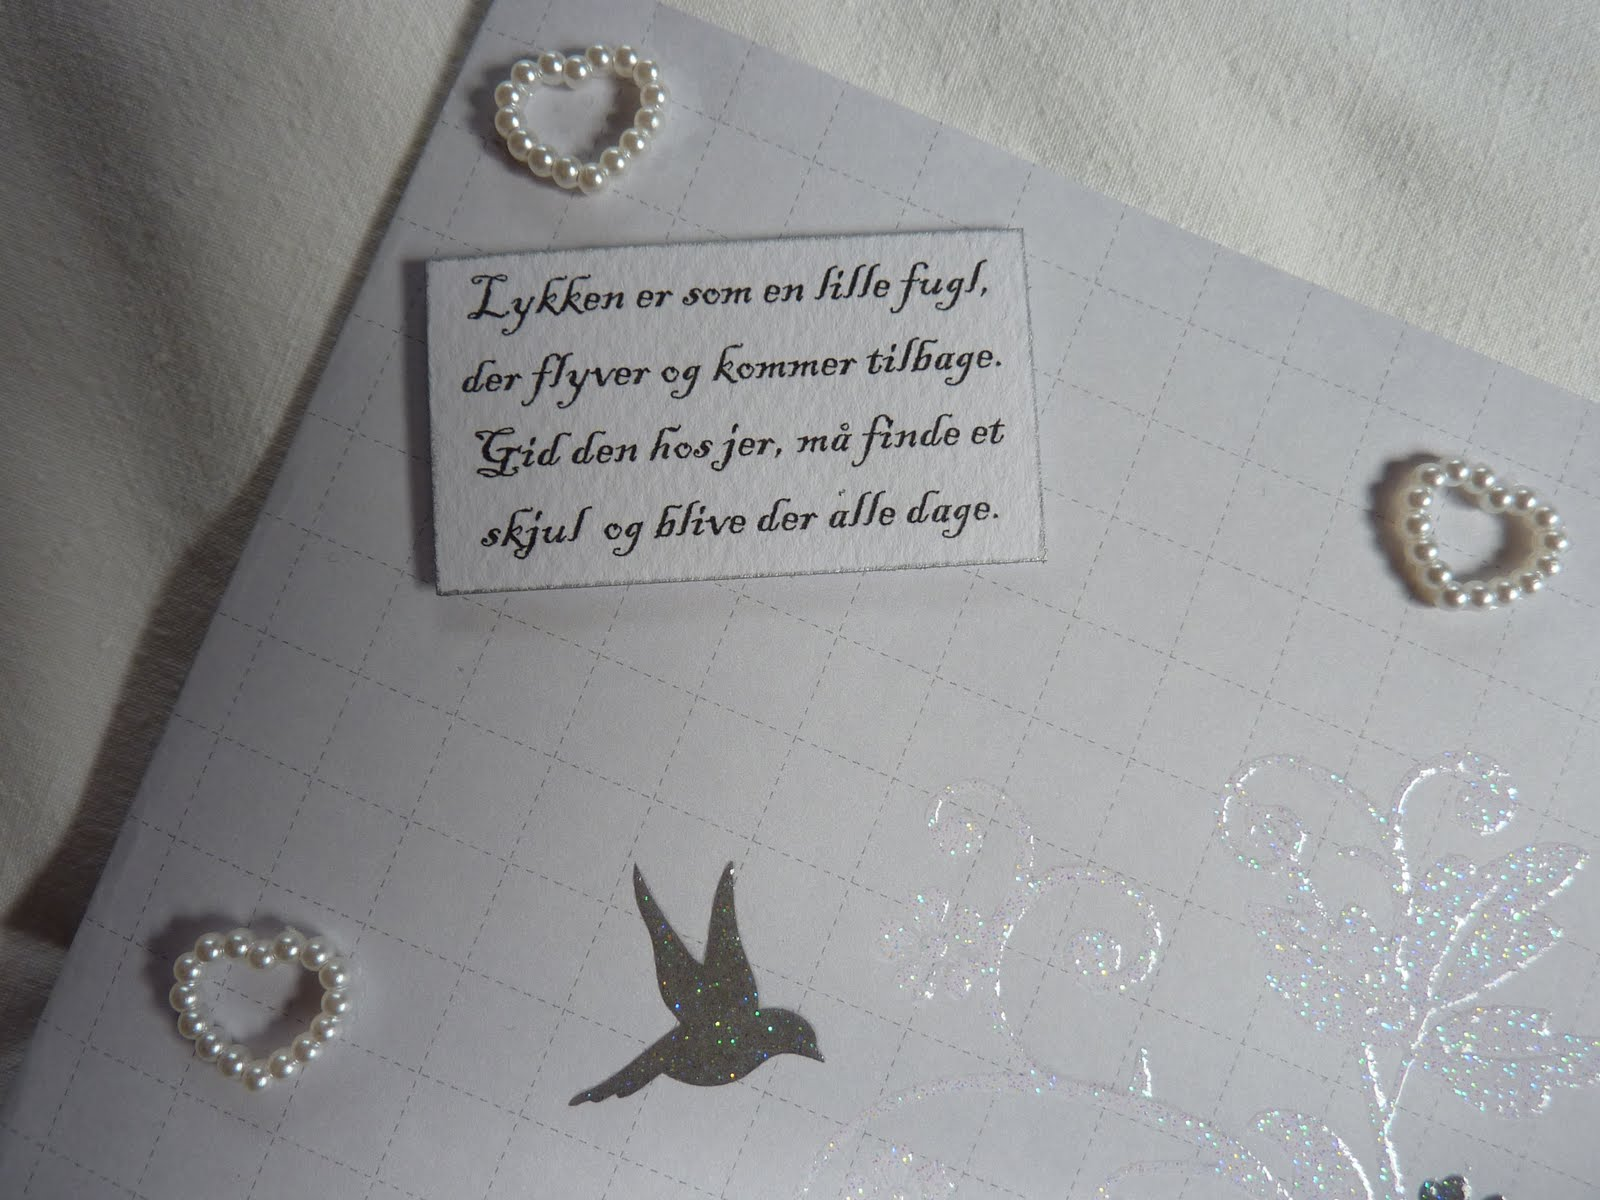 digte om bryllup